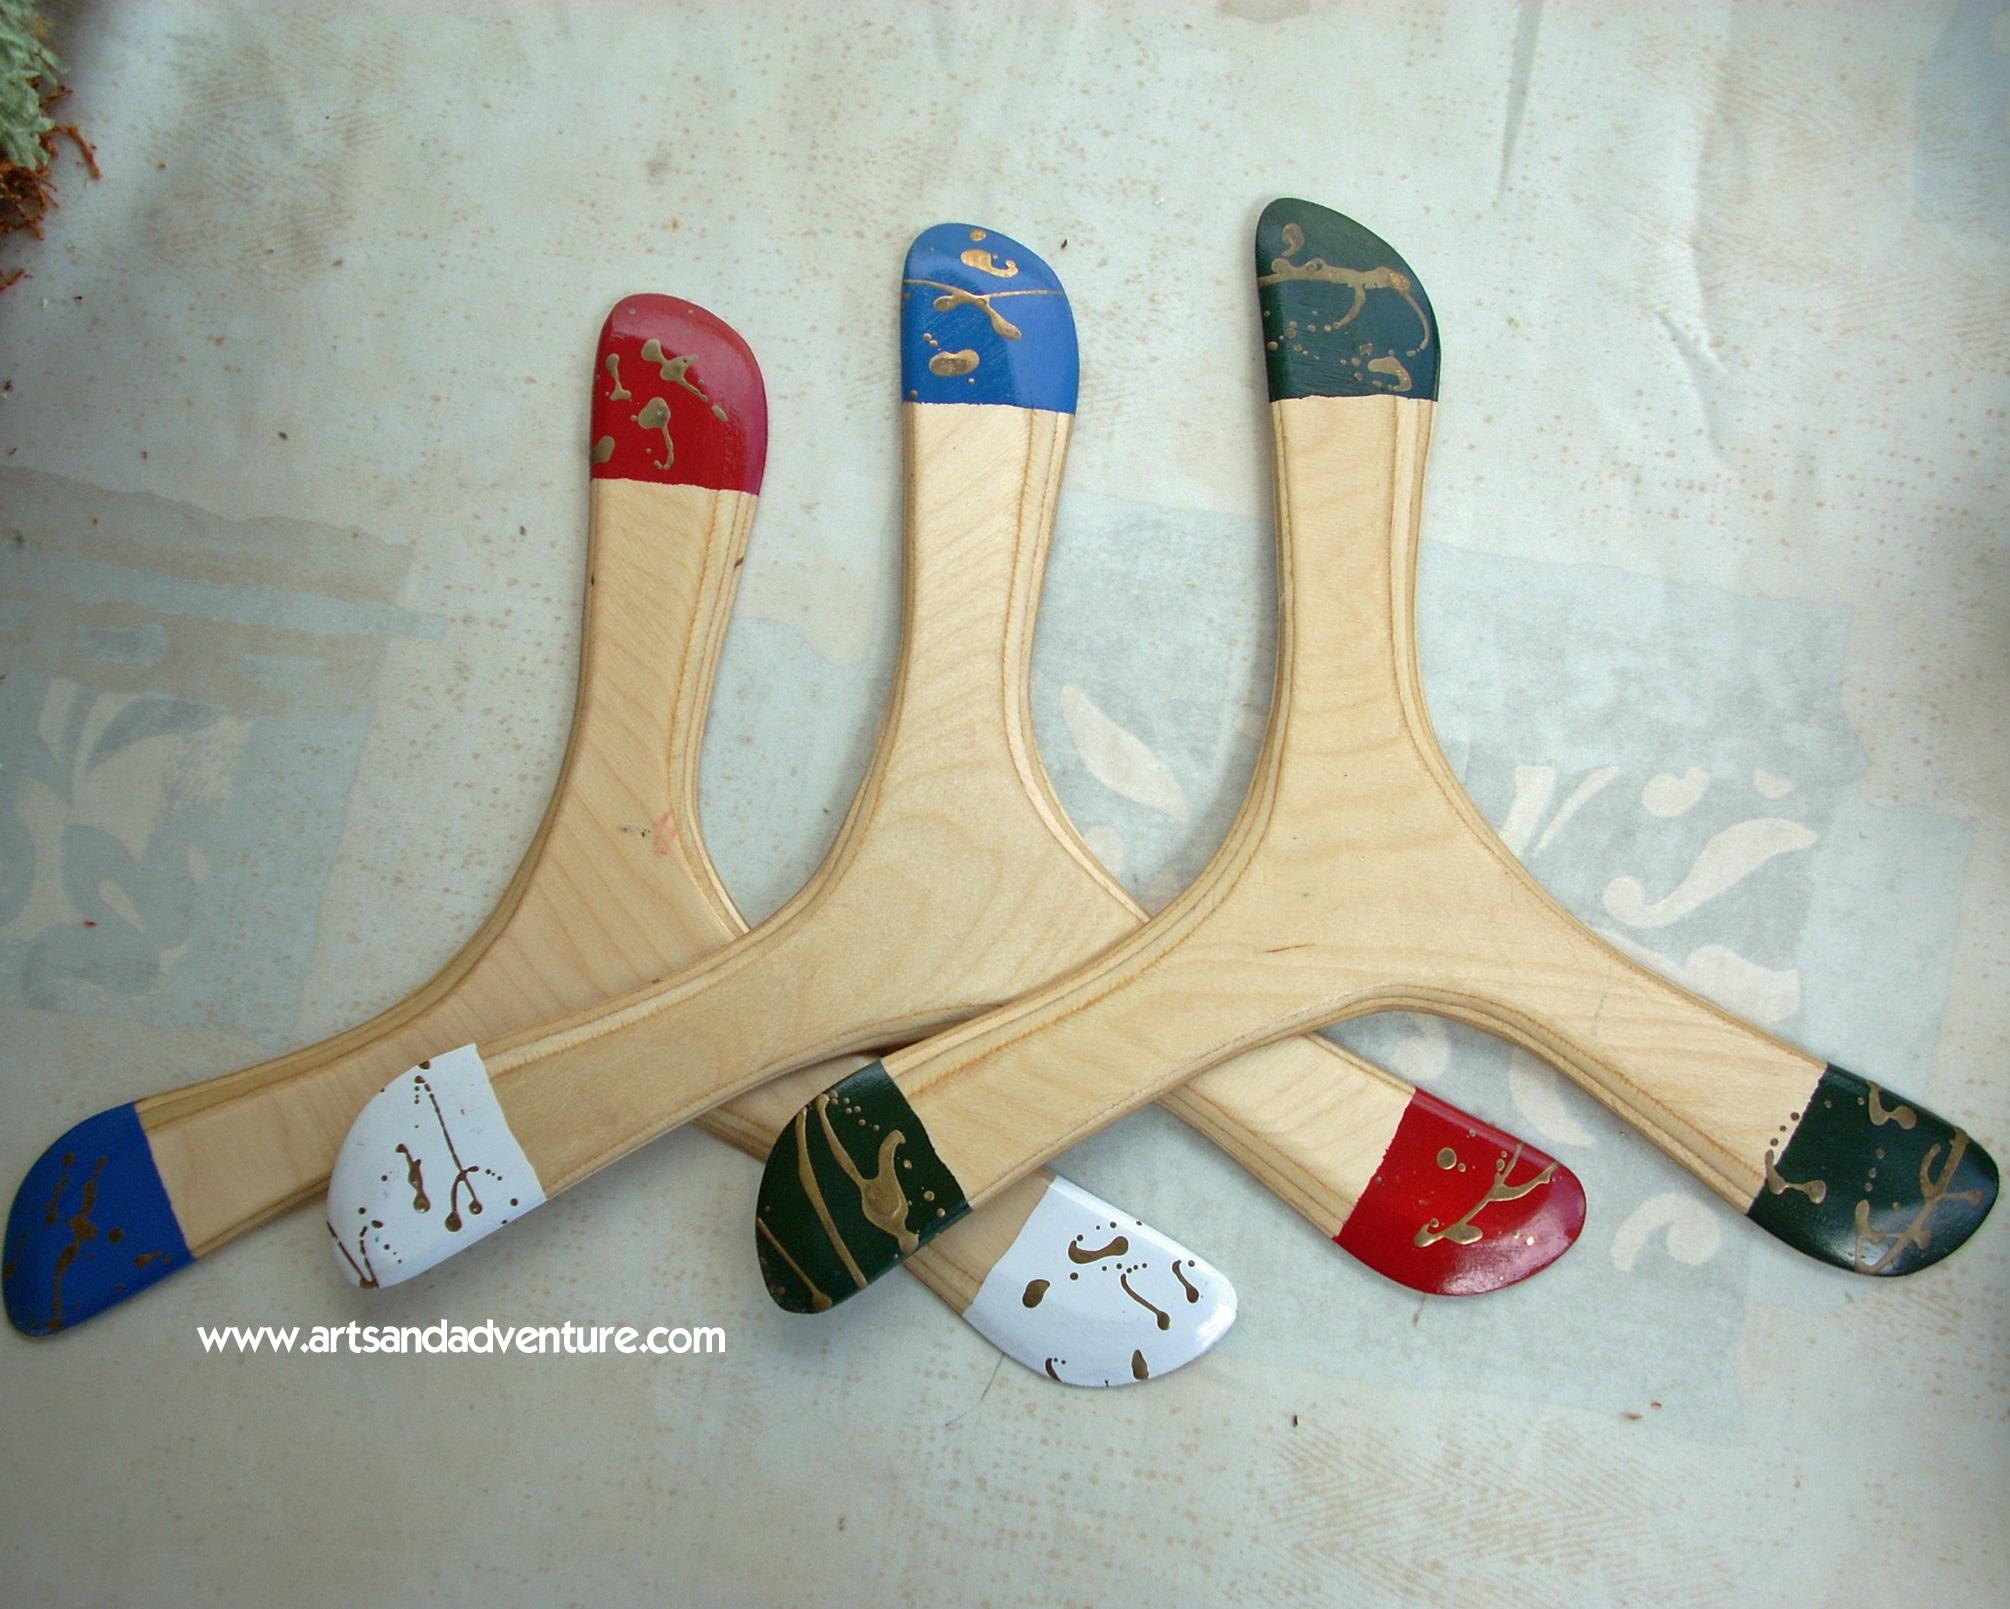 boomerangs - image